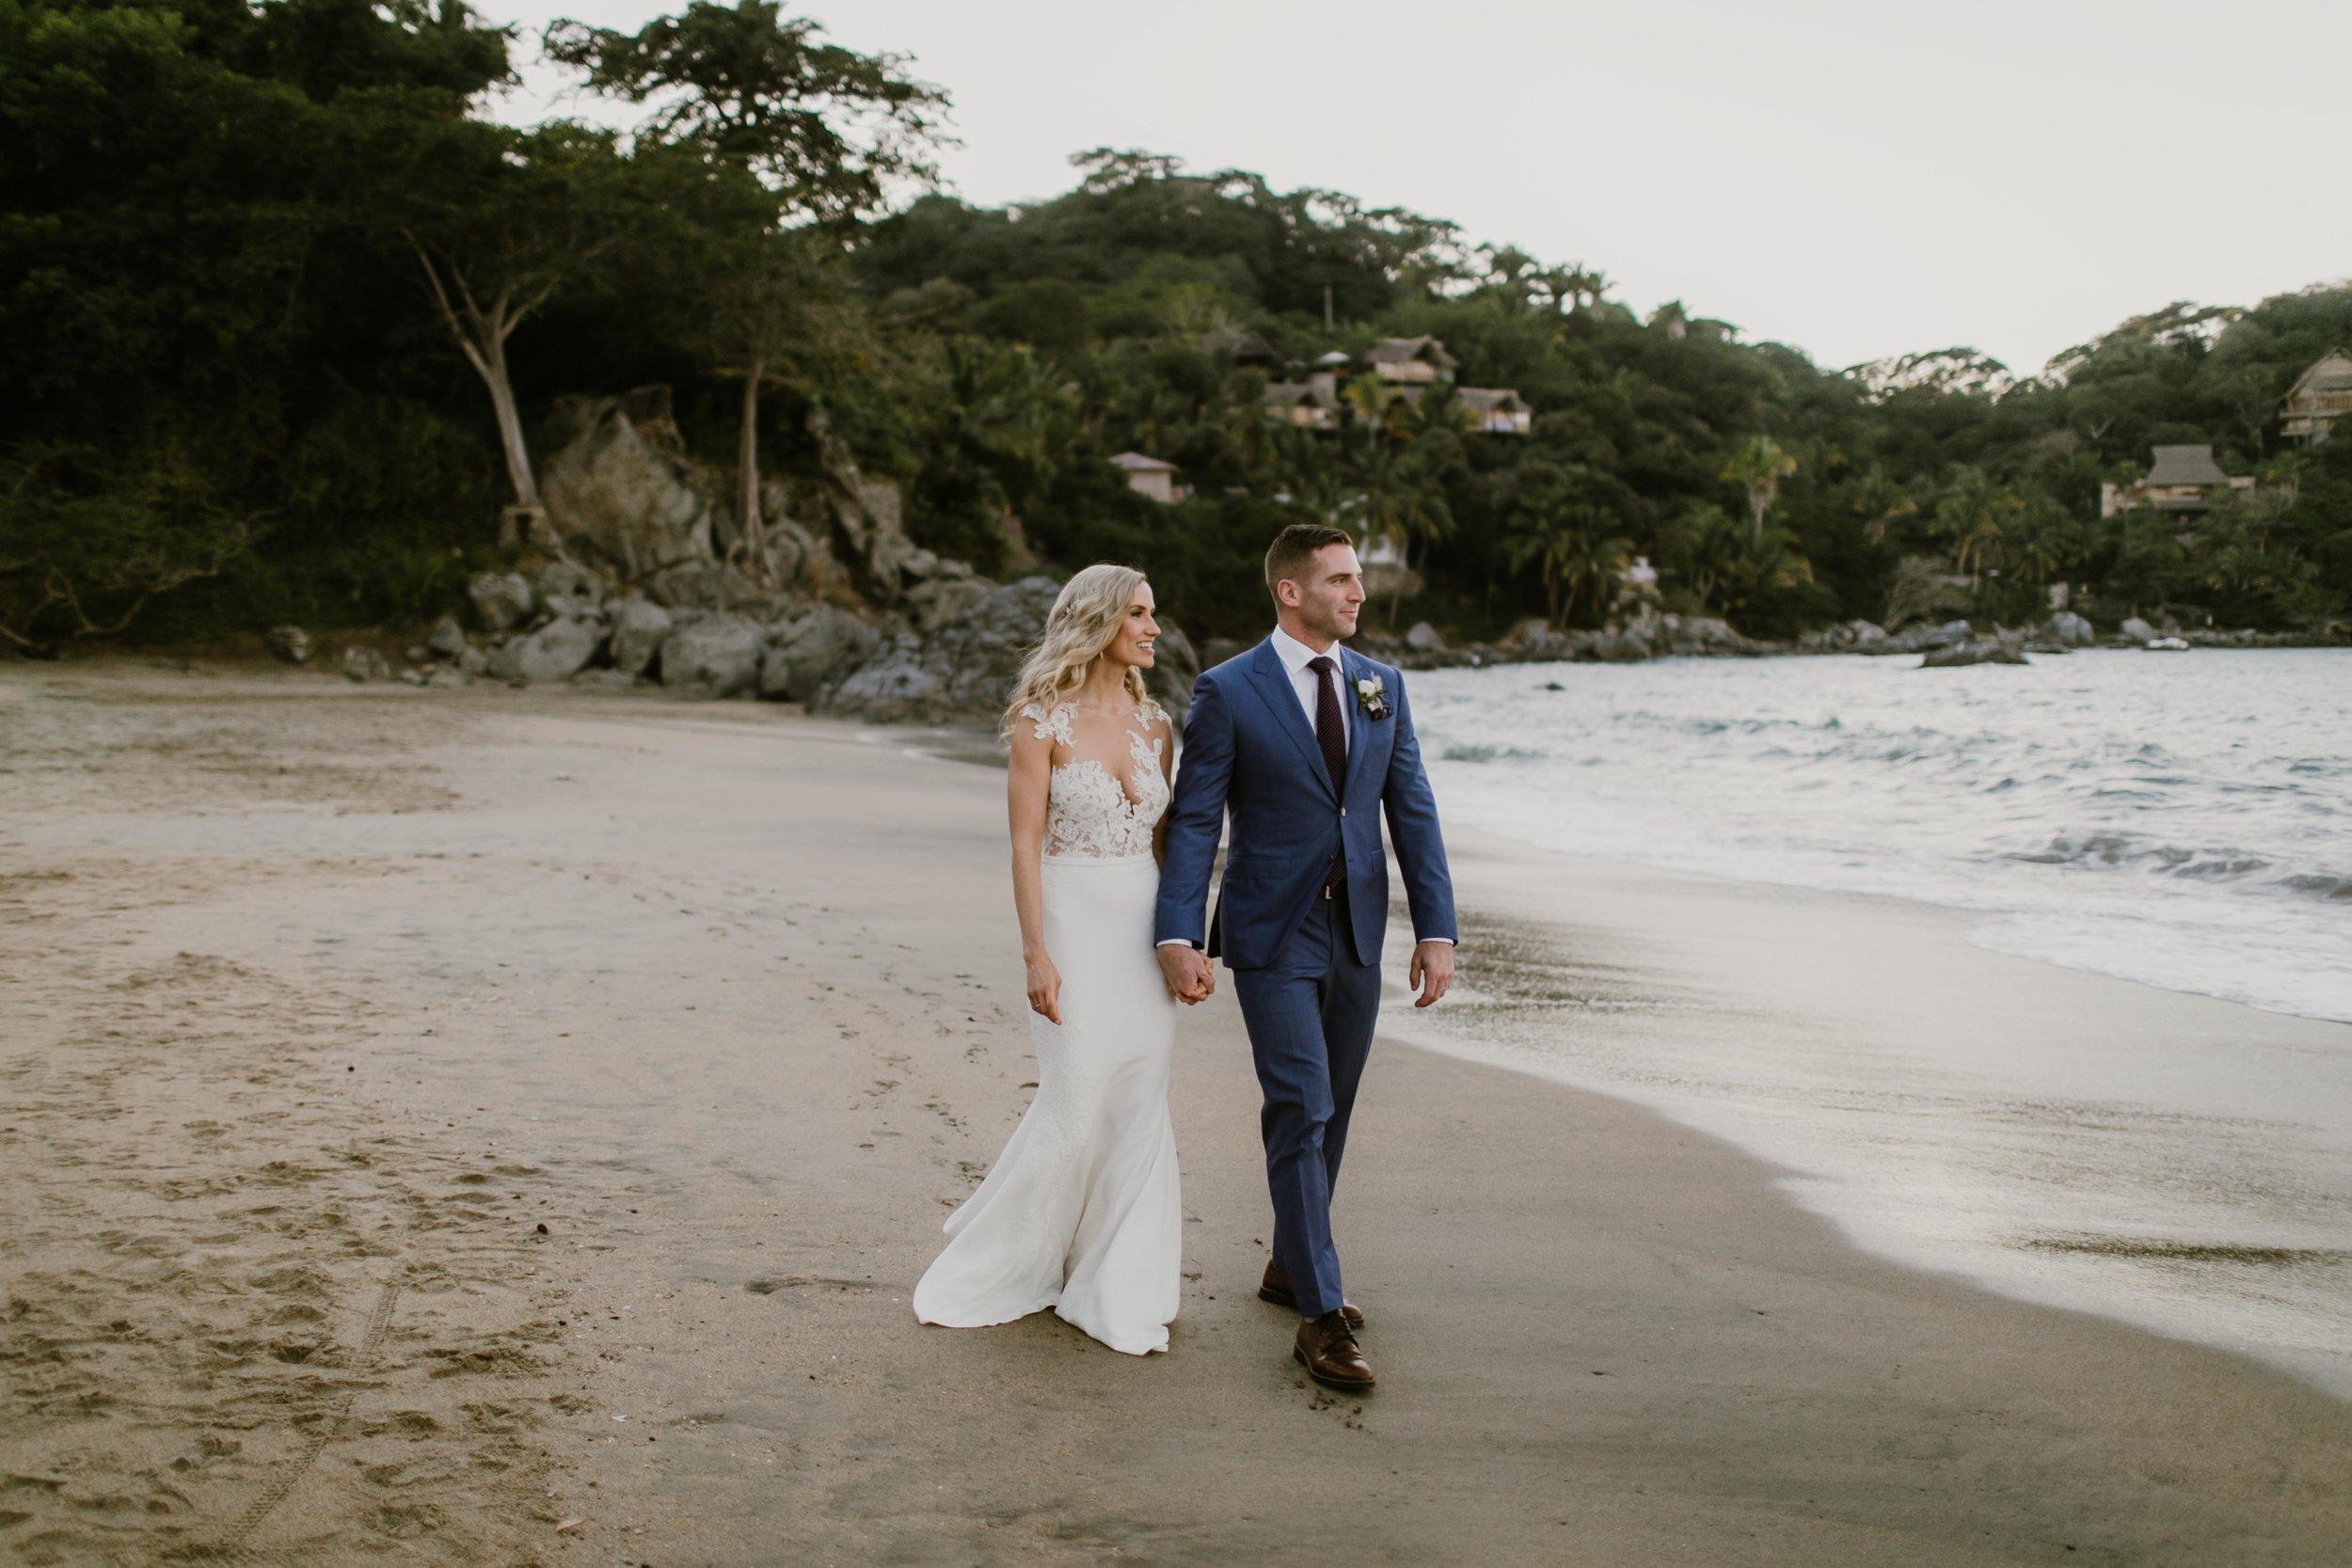 sayulita-wedding-photography-12.jpg